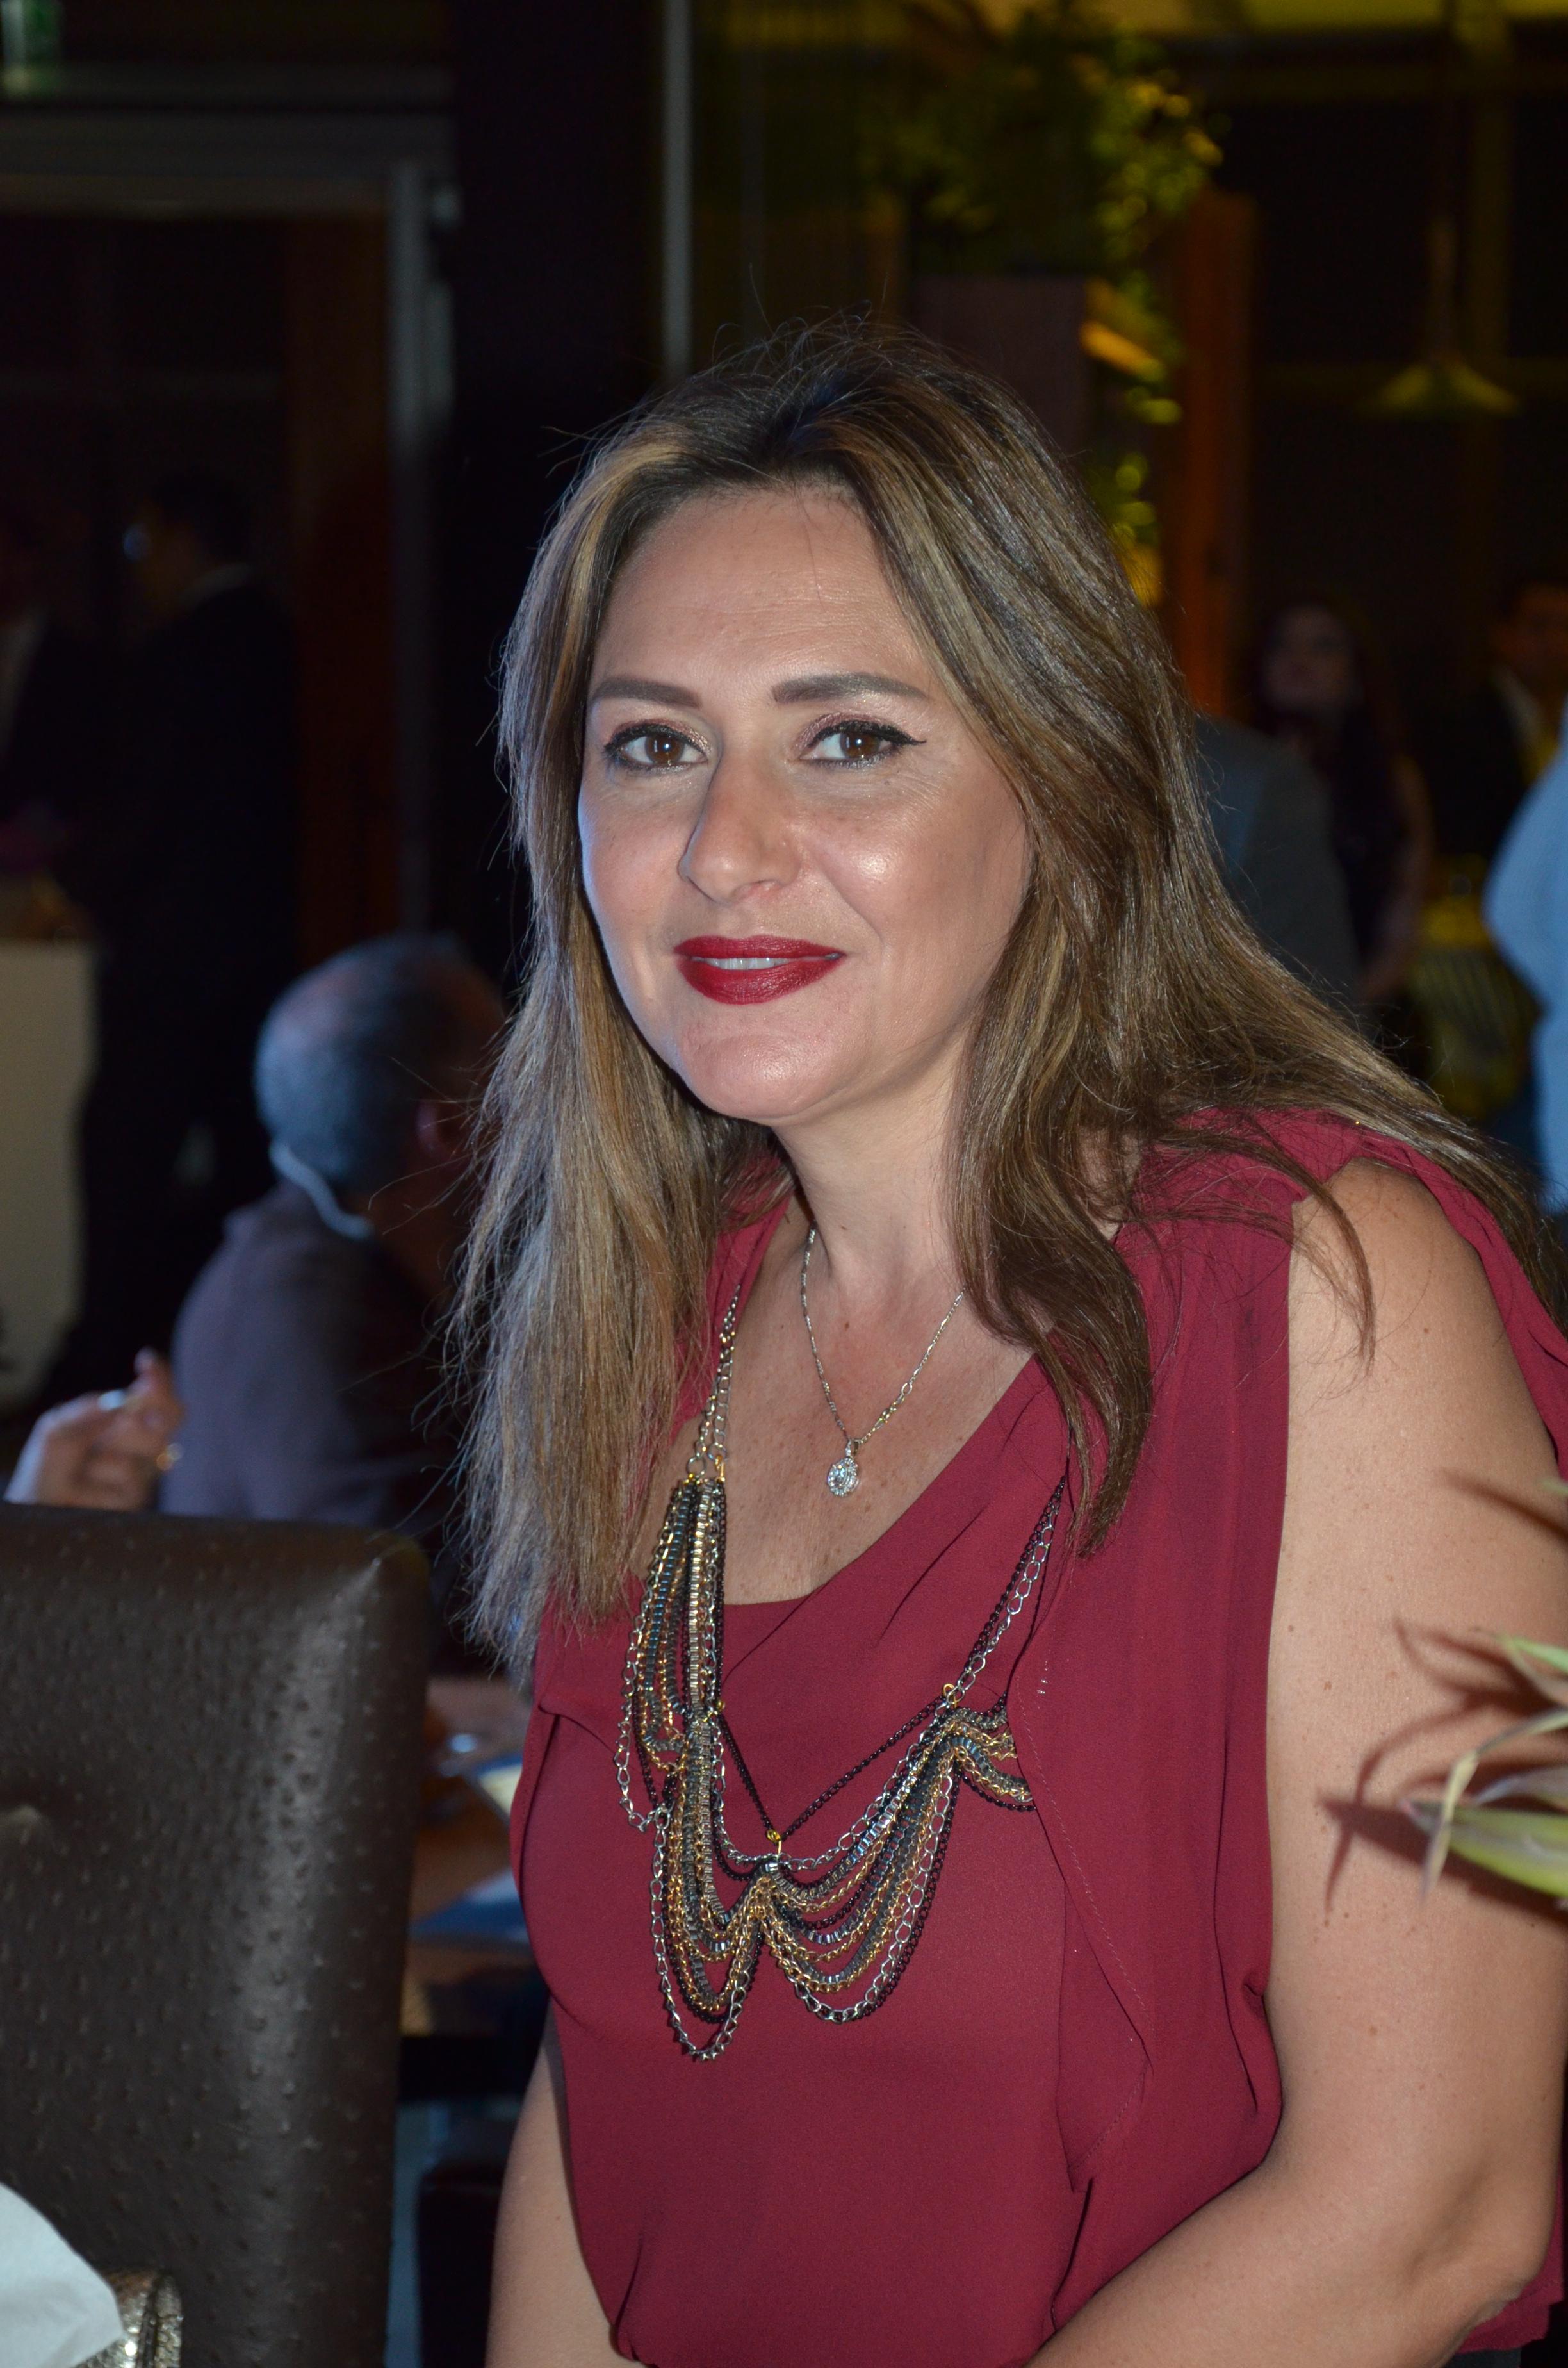 Ms. Mahinaz Nessim